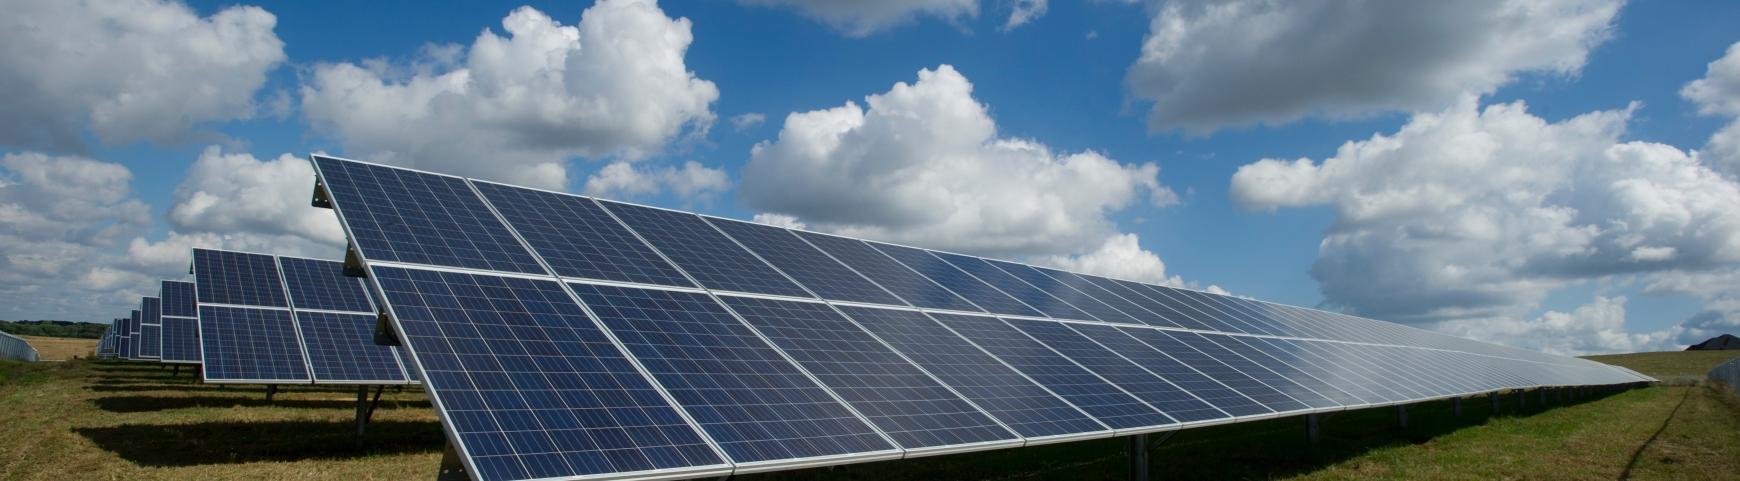 Solar panels in the sunshine